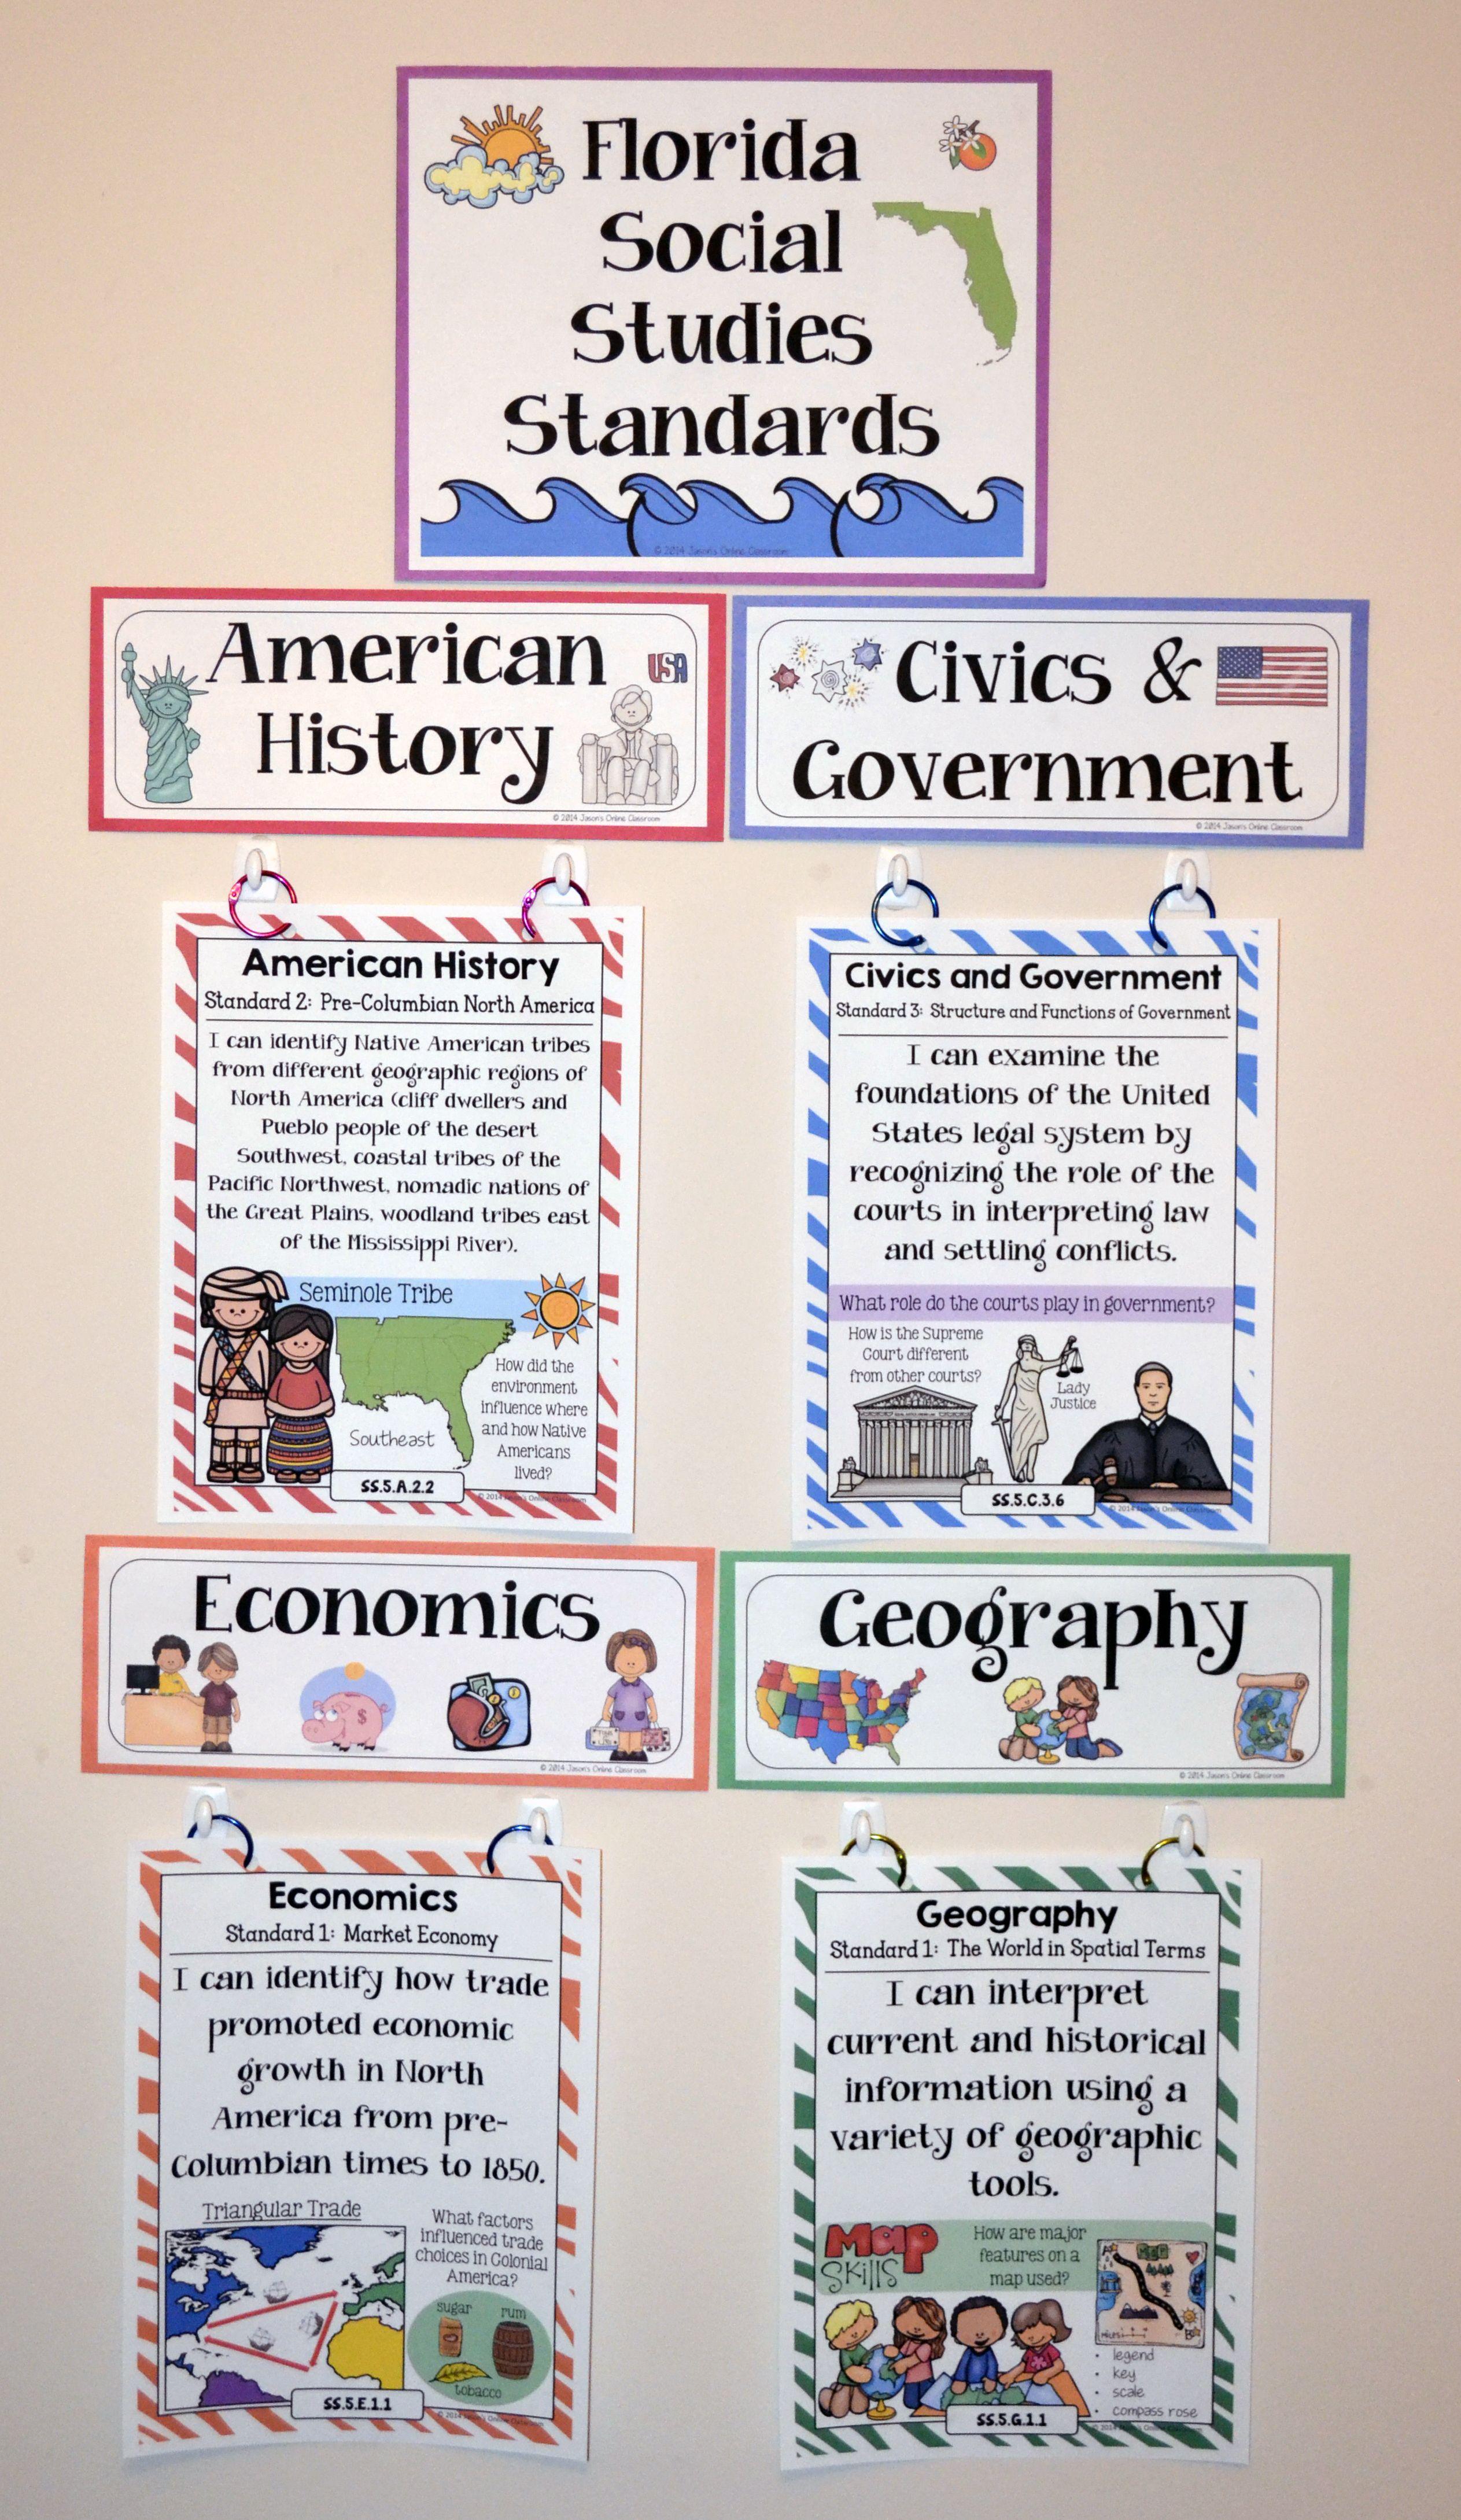 Florida Social Studies Standards - 5th Grade   Social studies [ 4356 x 2526 Pixel ]